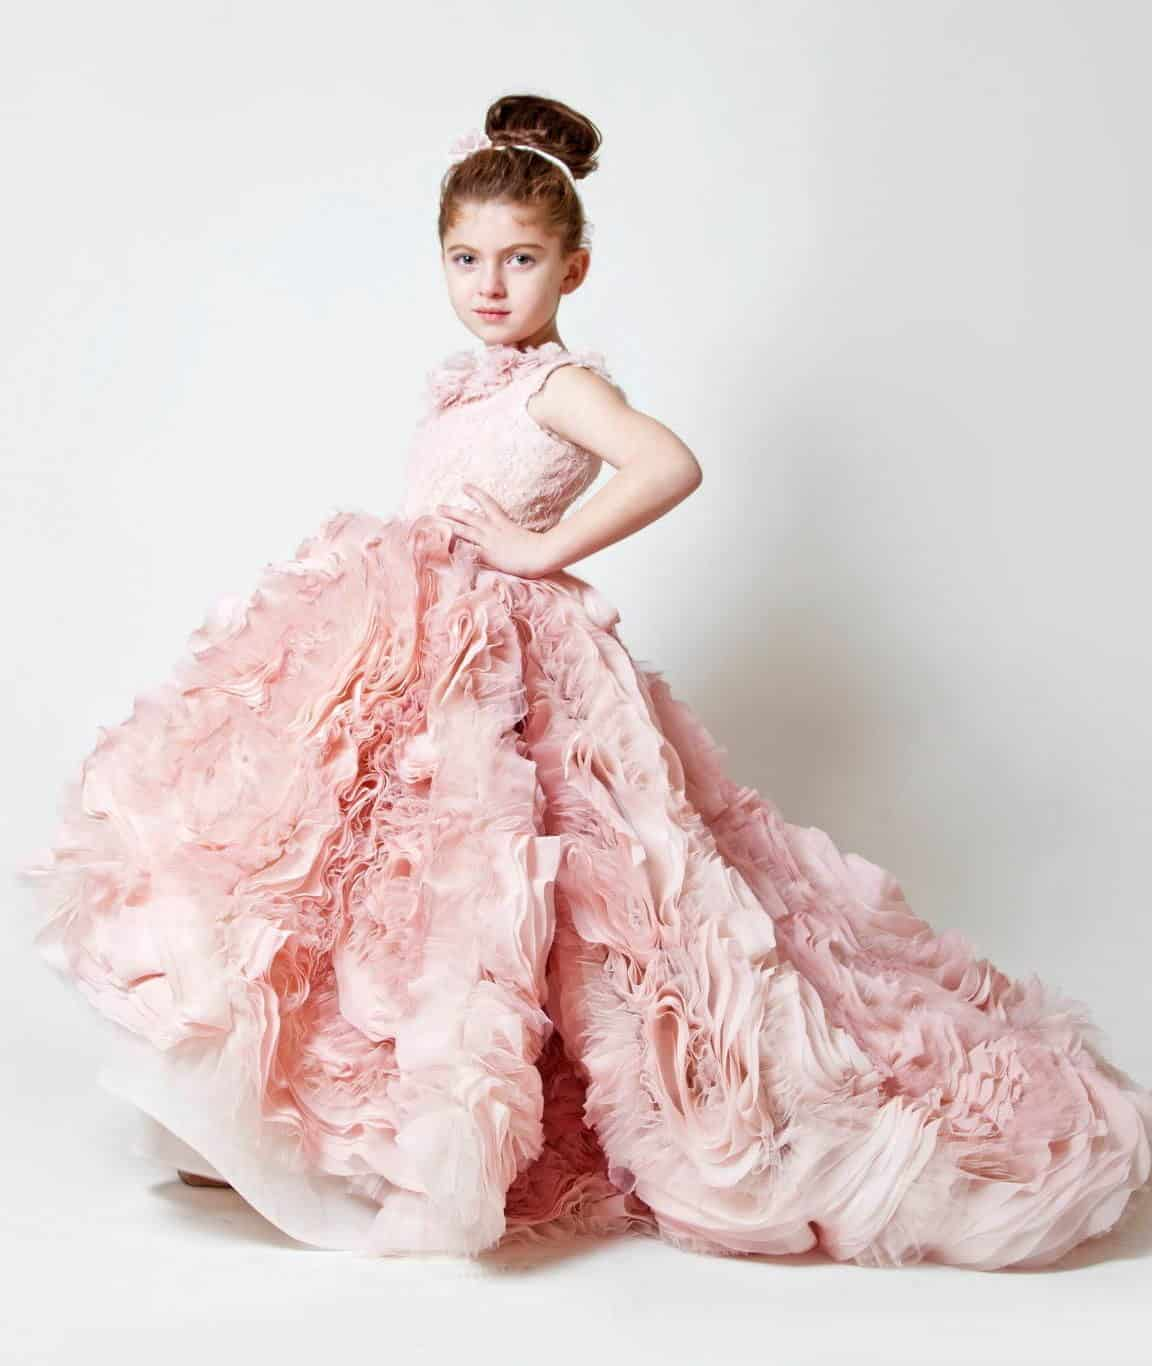 flower girl with a pink dress by Krikor Jobatian